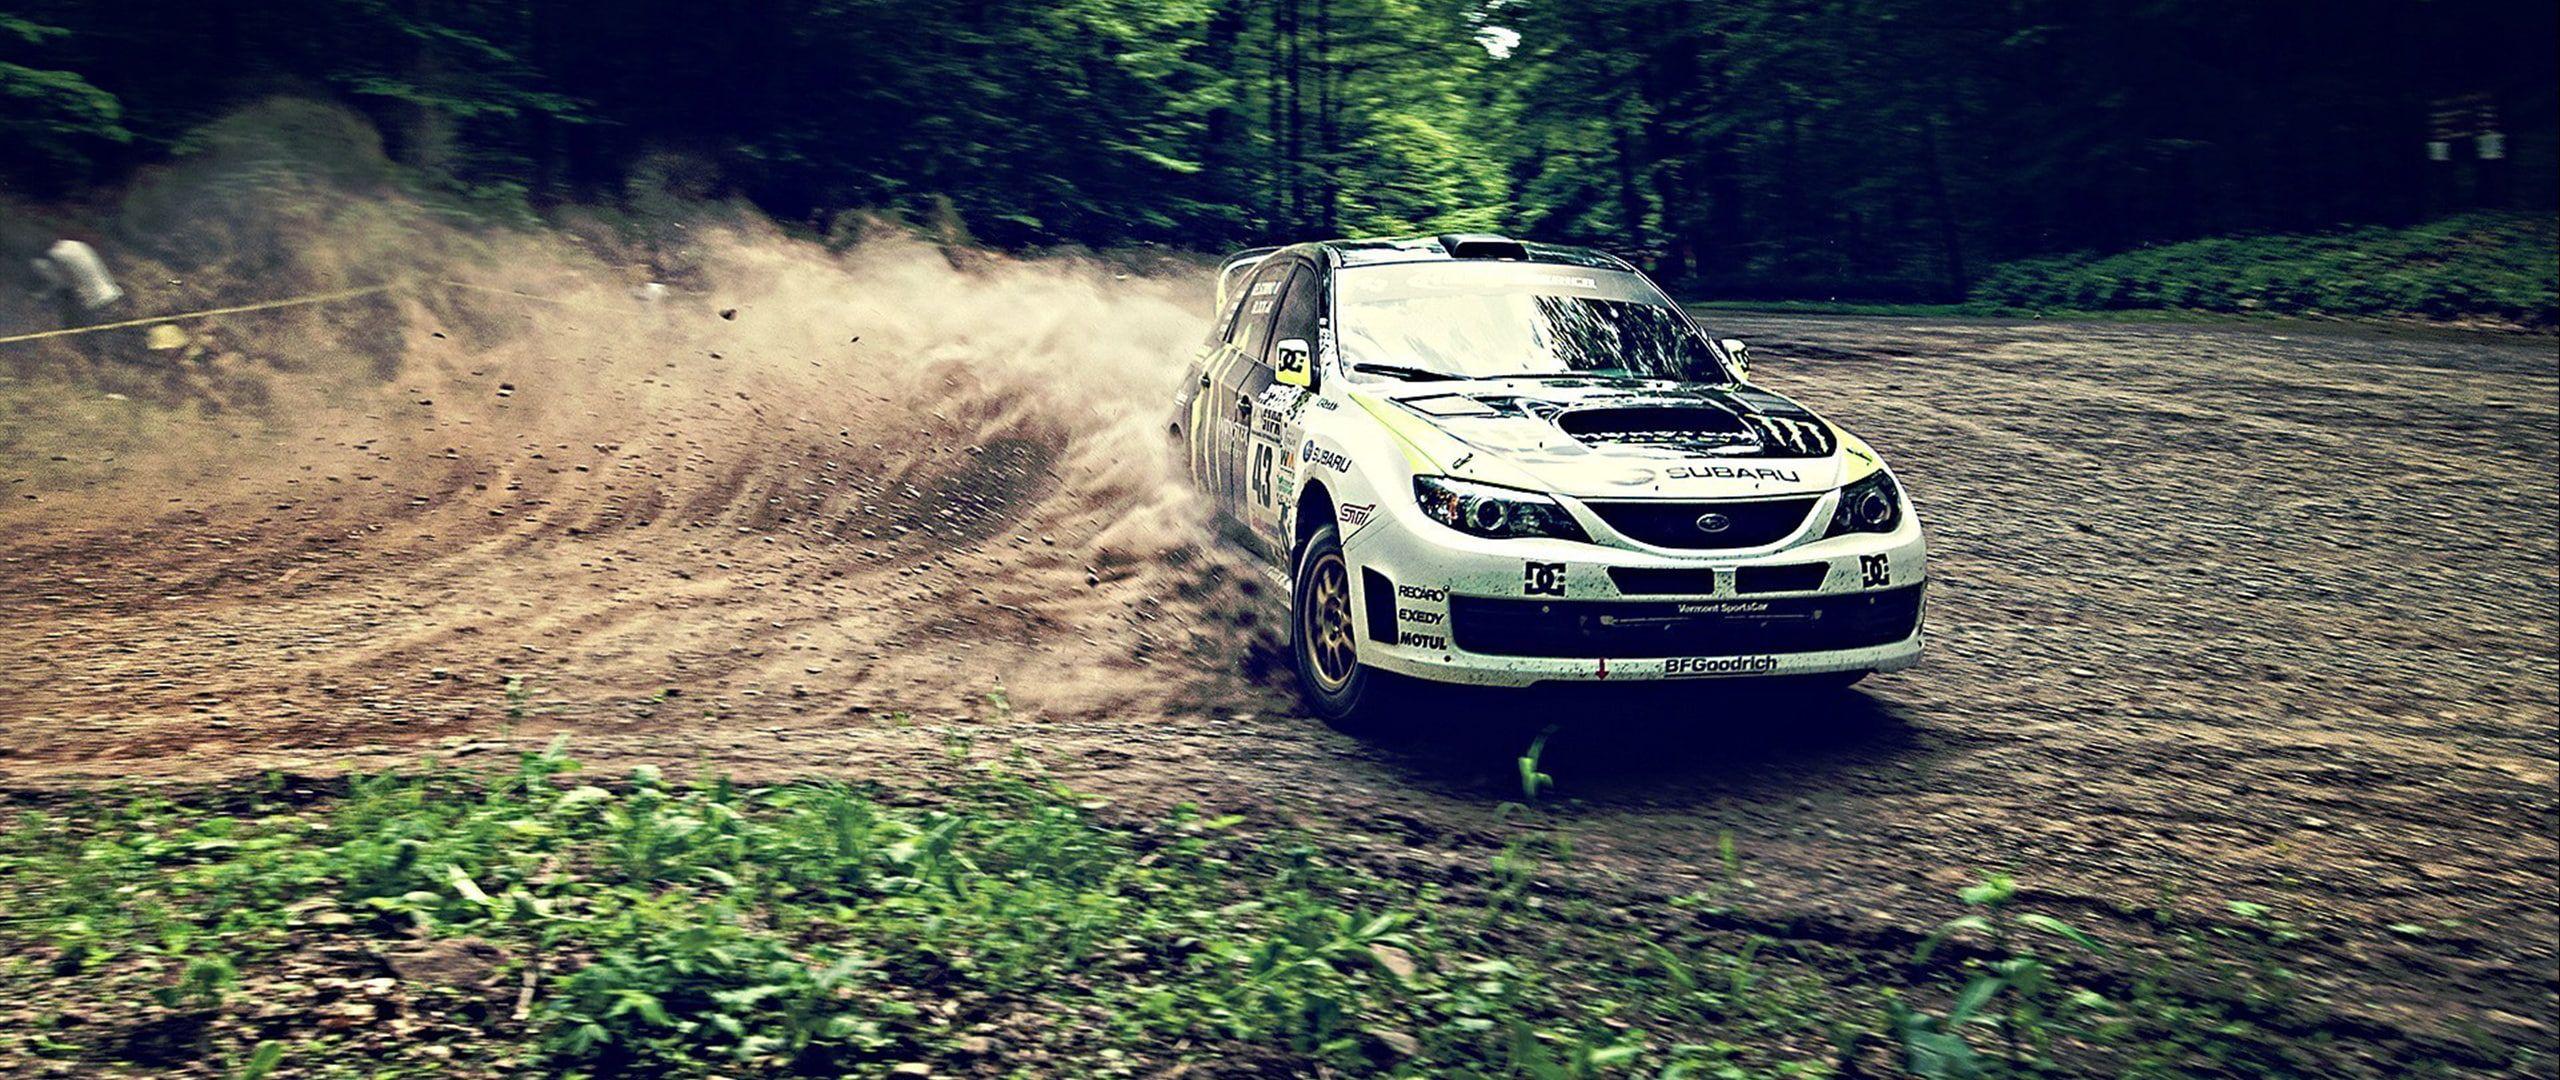 Ultra Wide Rally Rallye Subaru 2k Wallpaper Hdwallpaper Desktop In 2021 Subaru Japan Photography Hd Wallpaper